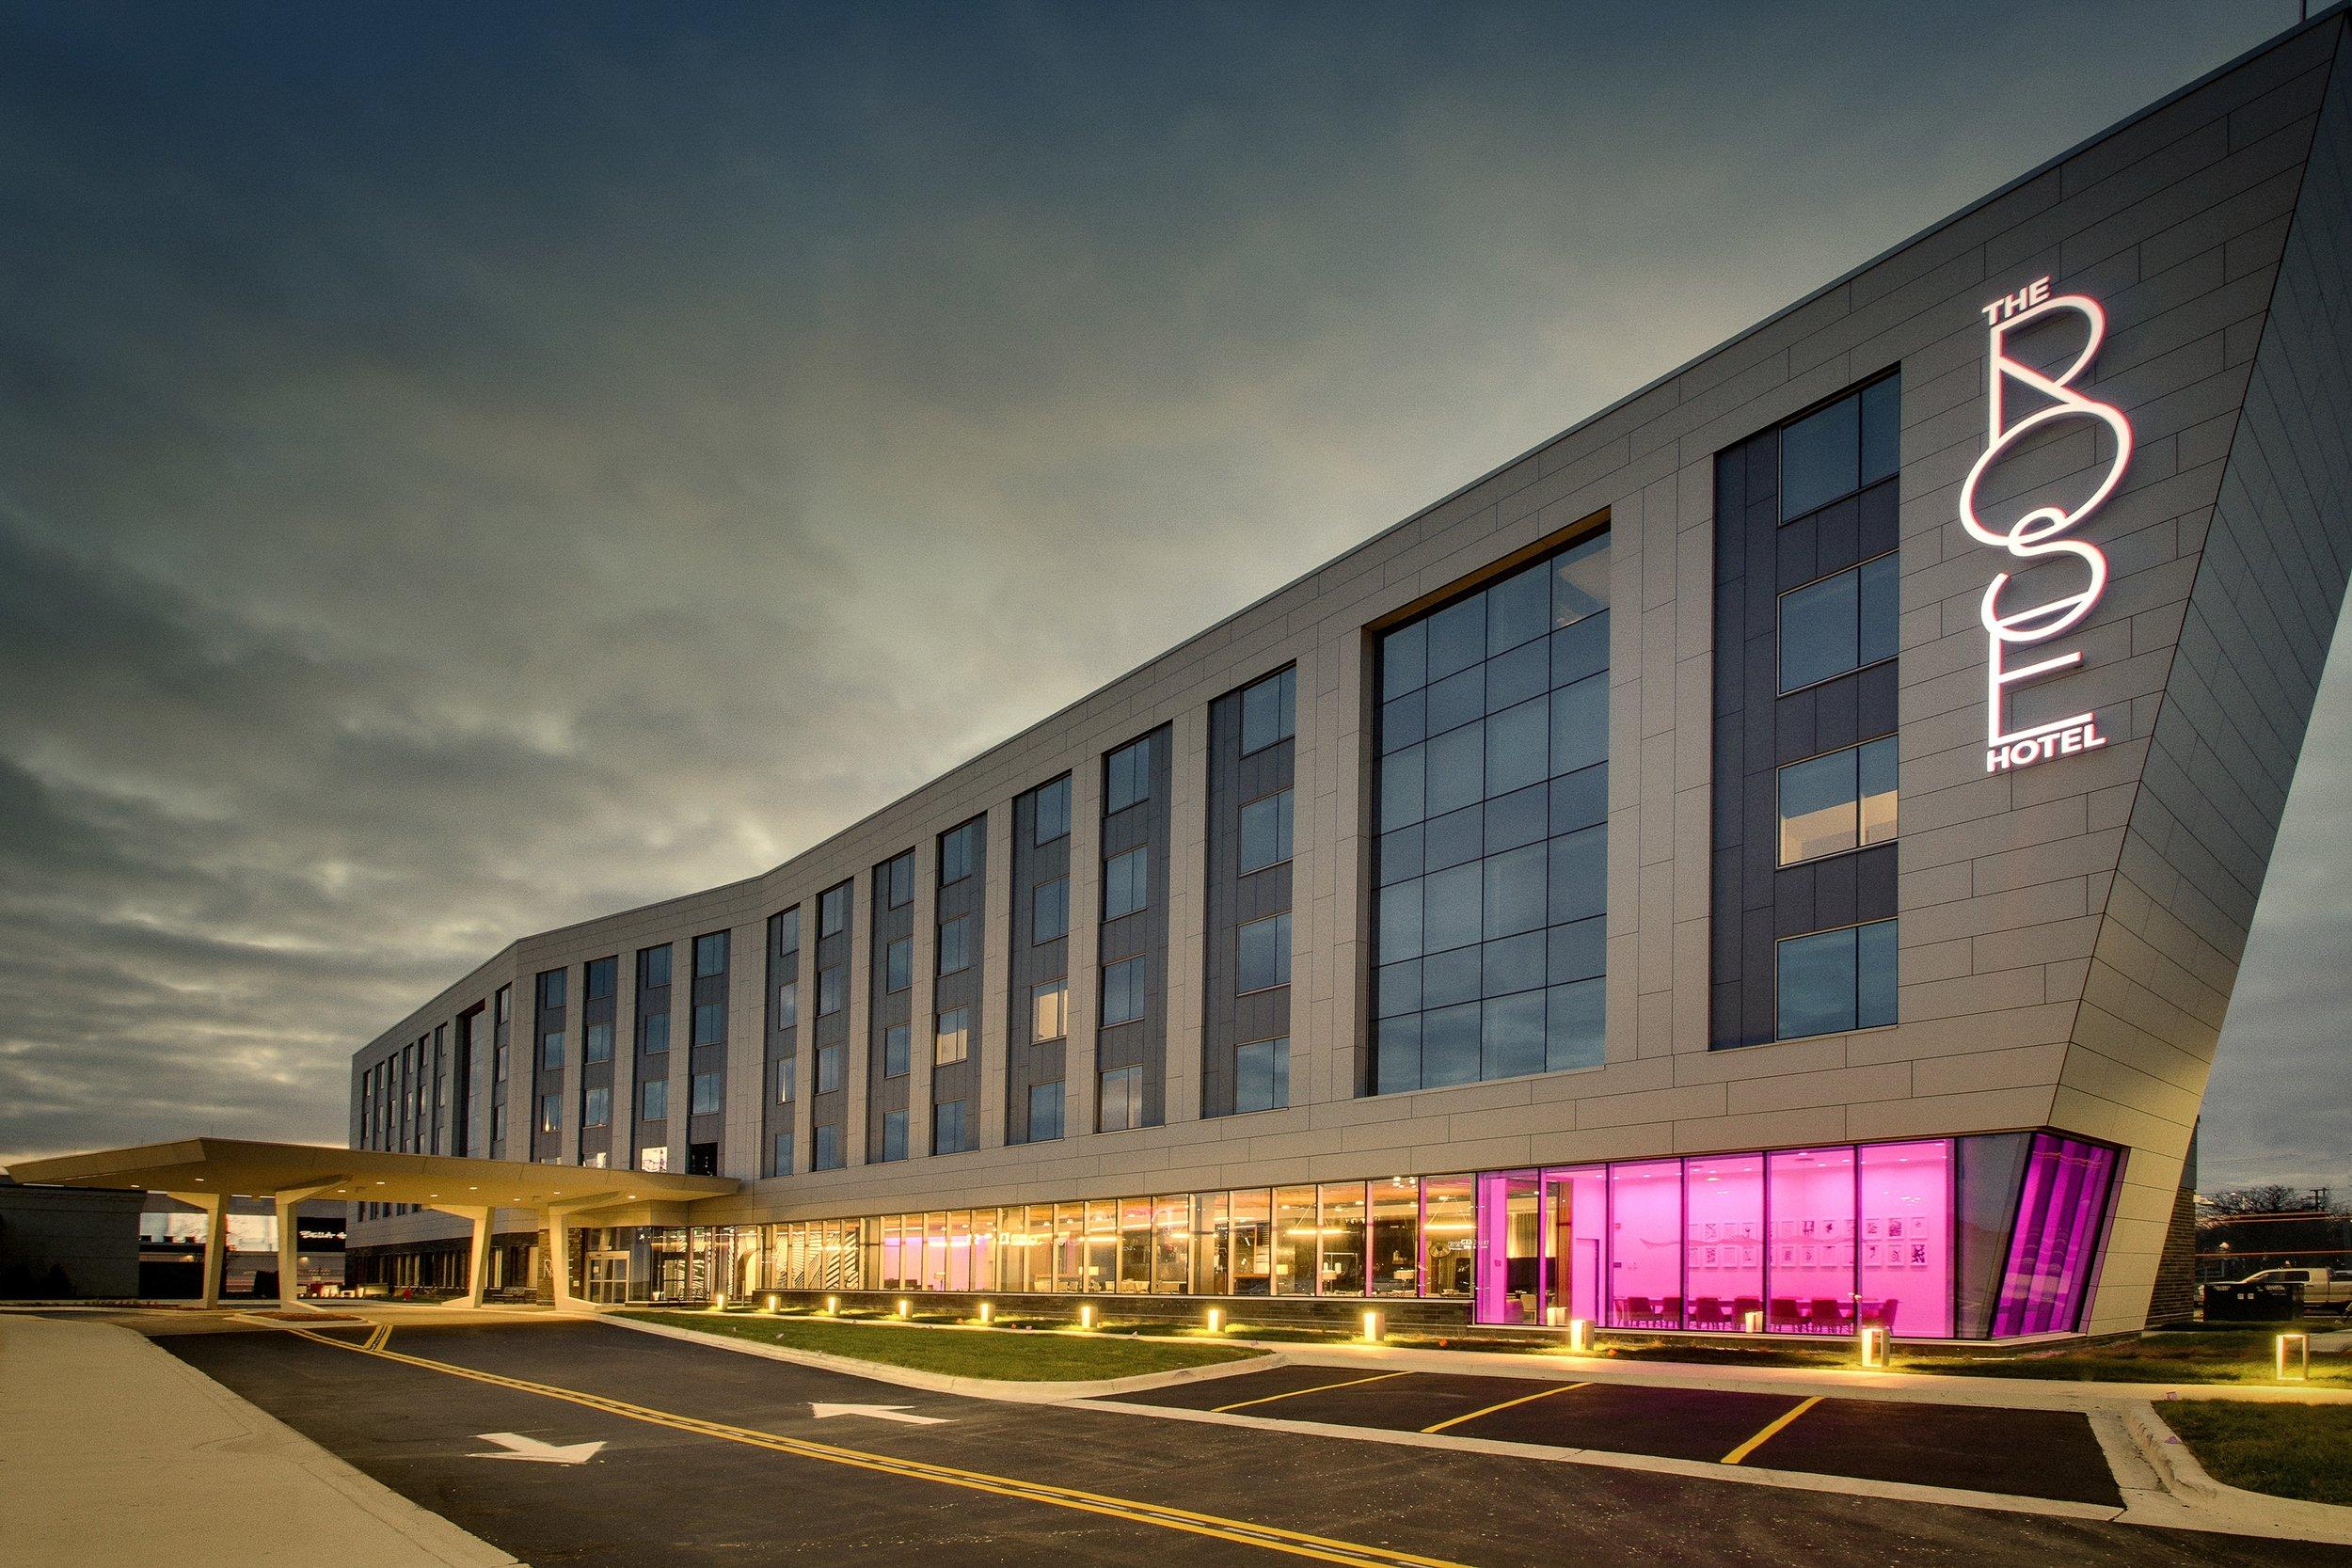 The Rose Hotel_Exterior.jpg